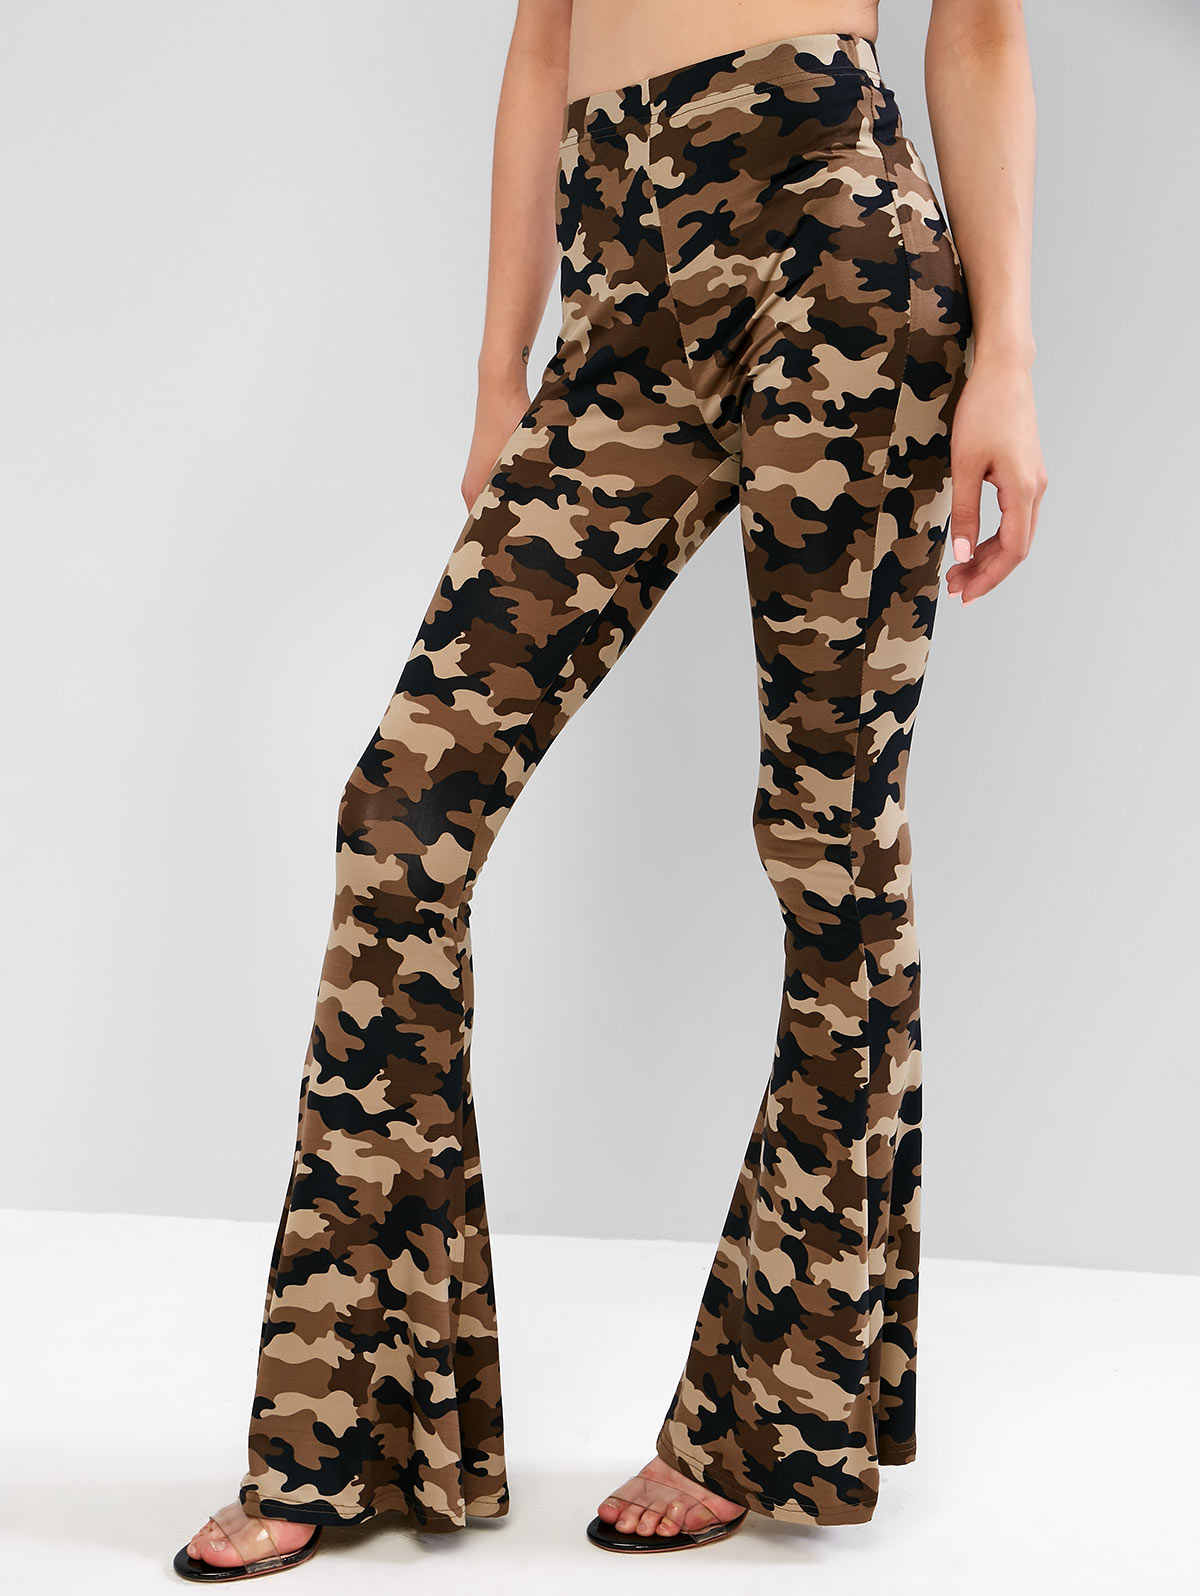 Zaful Pantalones Femeninos De Moda Camo Pantalones De Cintura Alta Para Mujer Pantalones De Campana Inferior Para Mujer Pantalones Y Pantalones Capri Aliexpress